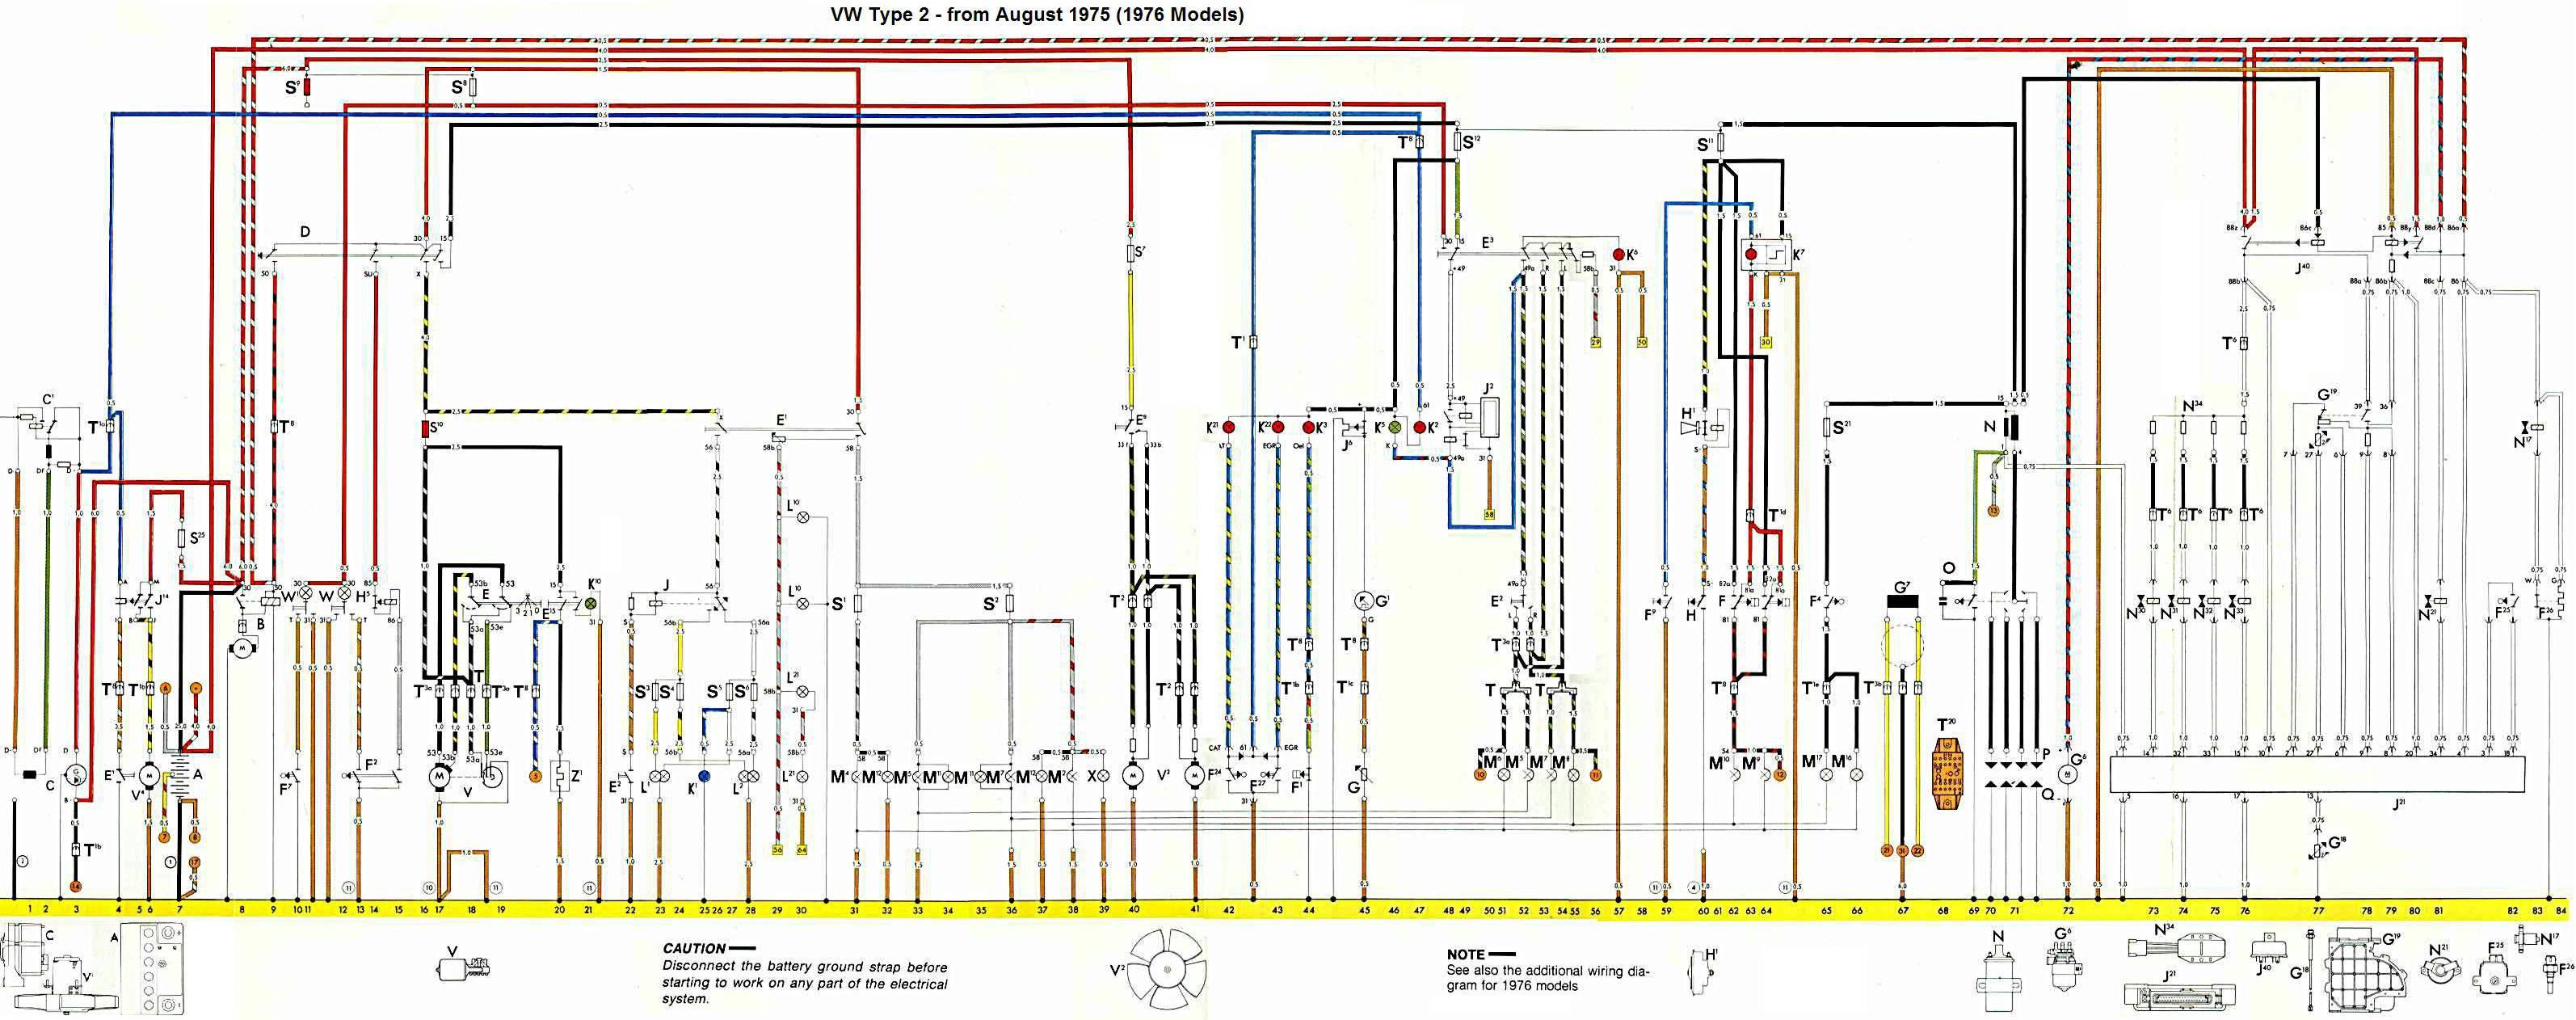 1971 porsche 914 wiring diagram farmall h generator fuse box relay 924